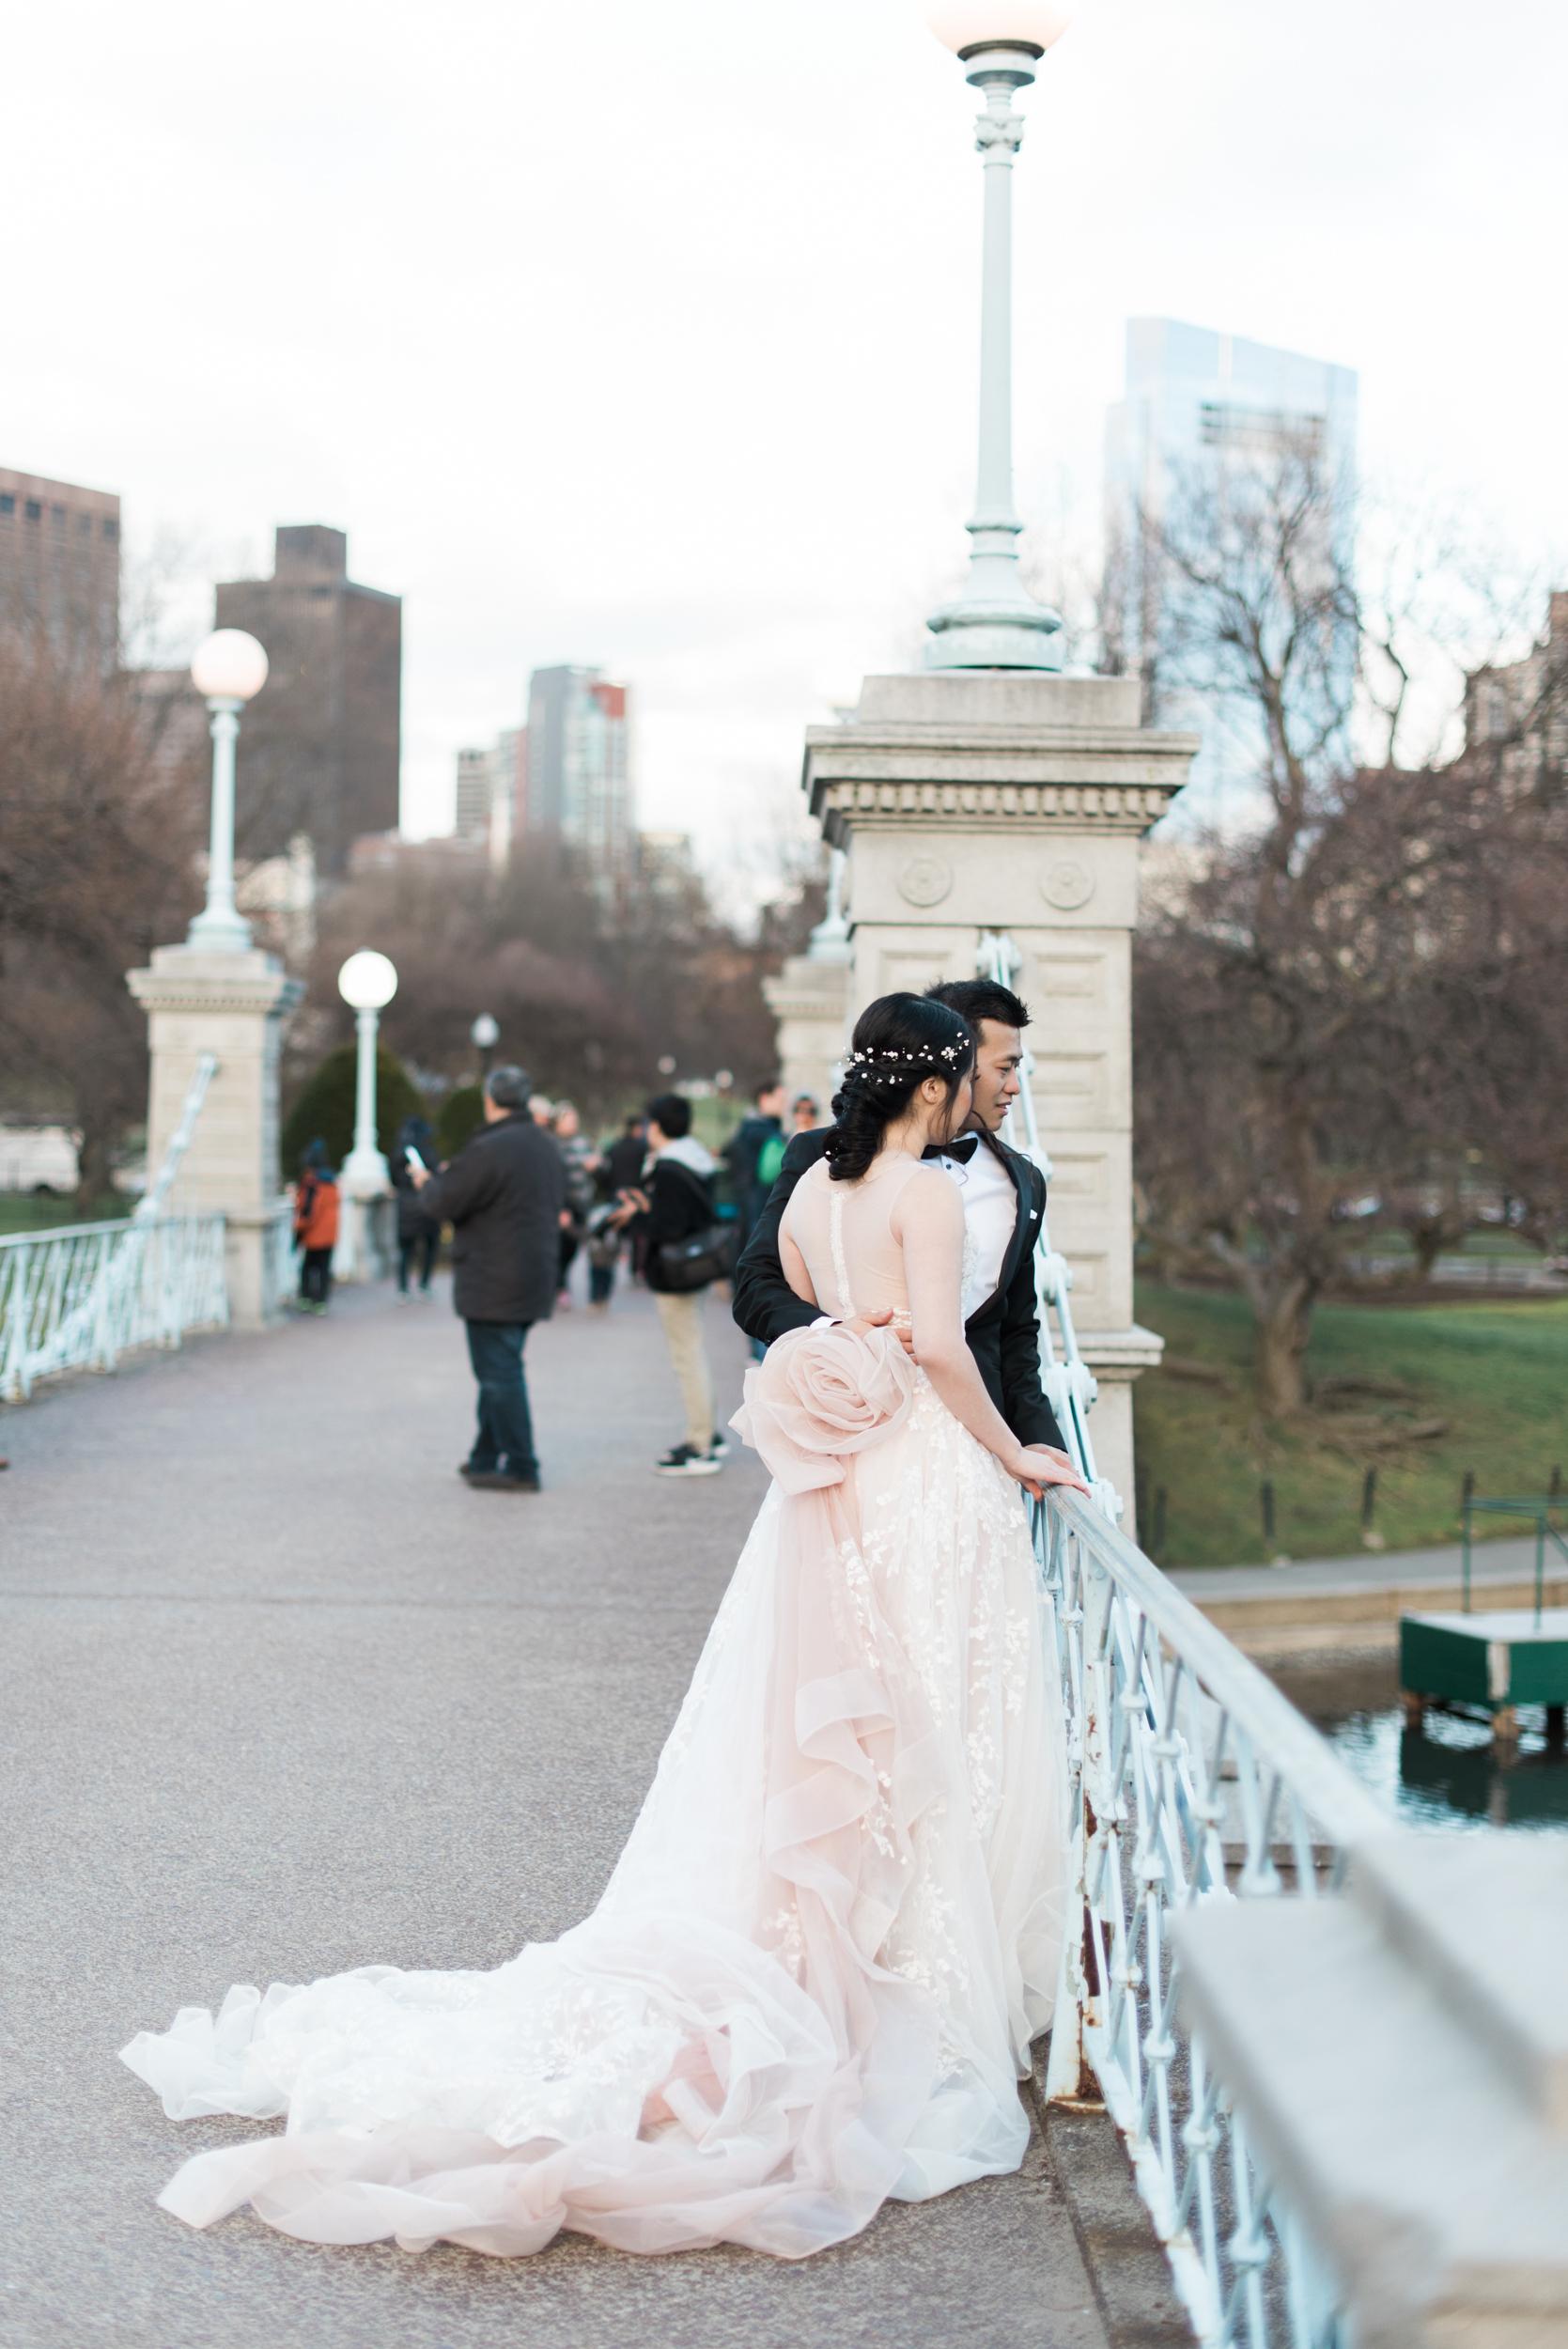 Boston Area Wedding Professional Photographer